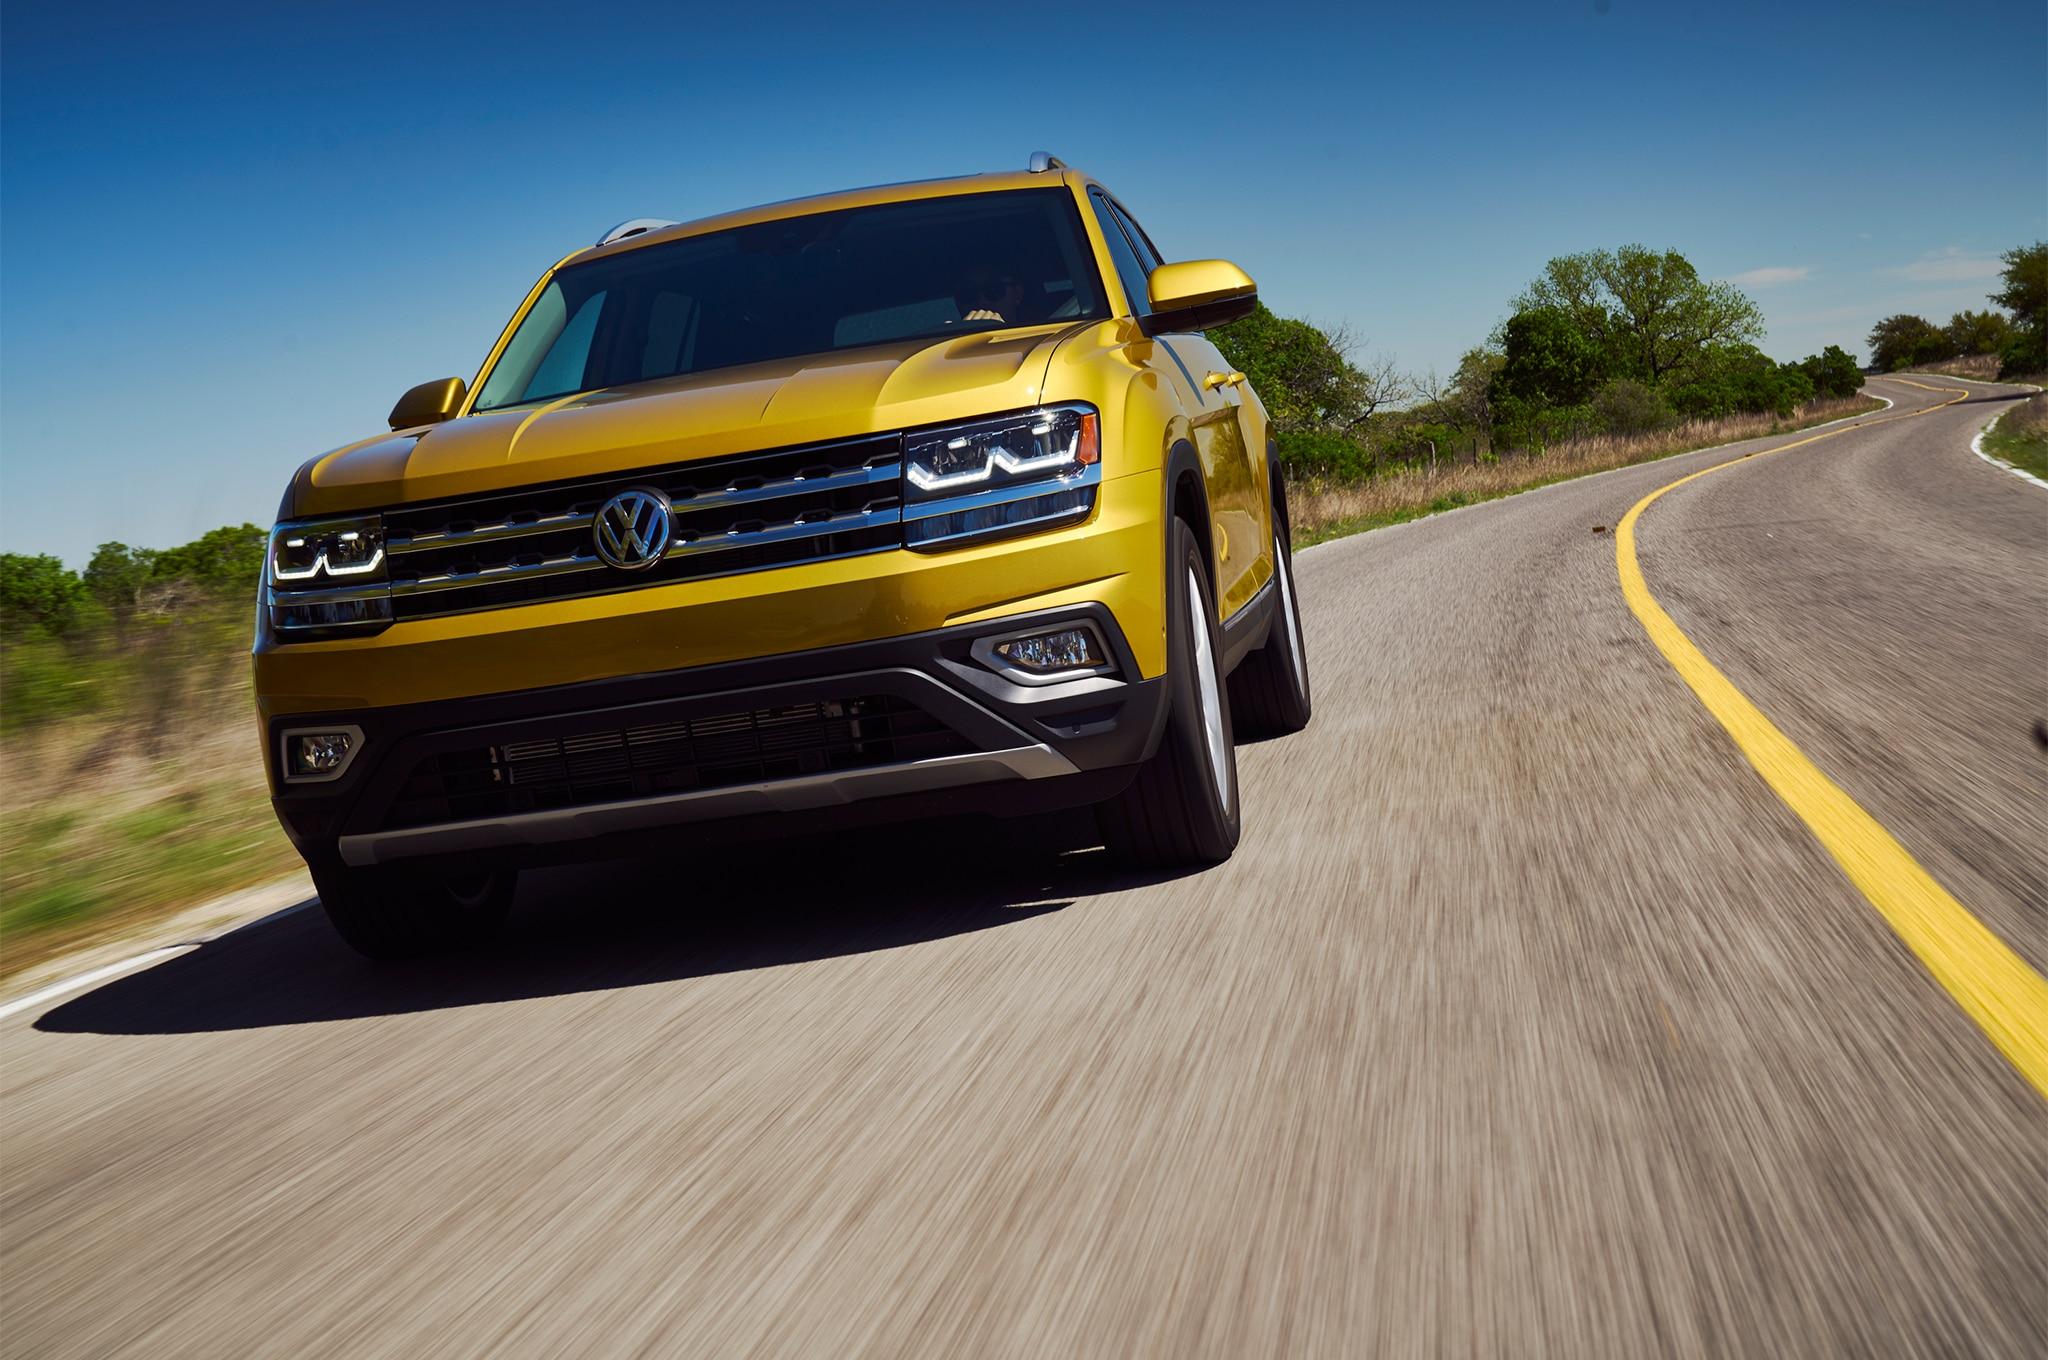 2018 Volkswagen Atlas Front Three Quarter In Motion 05 6